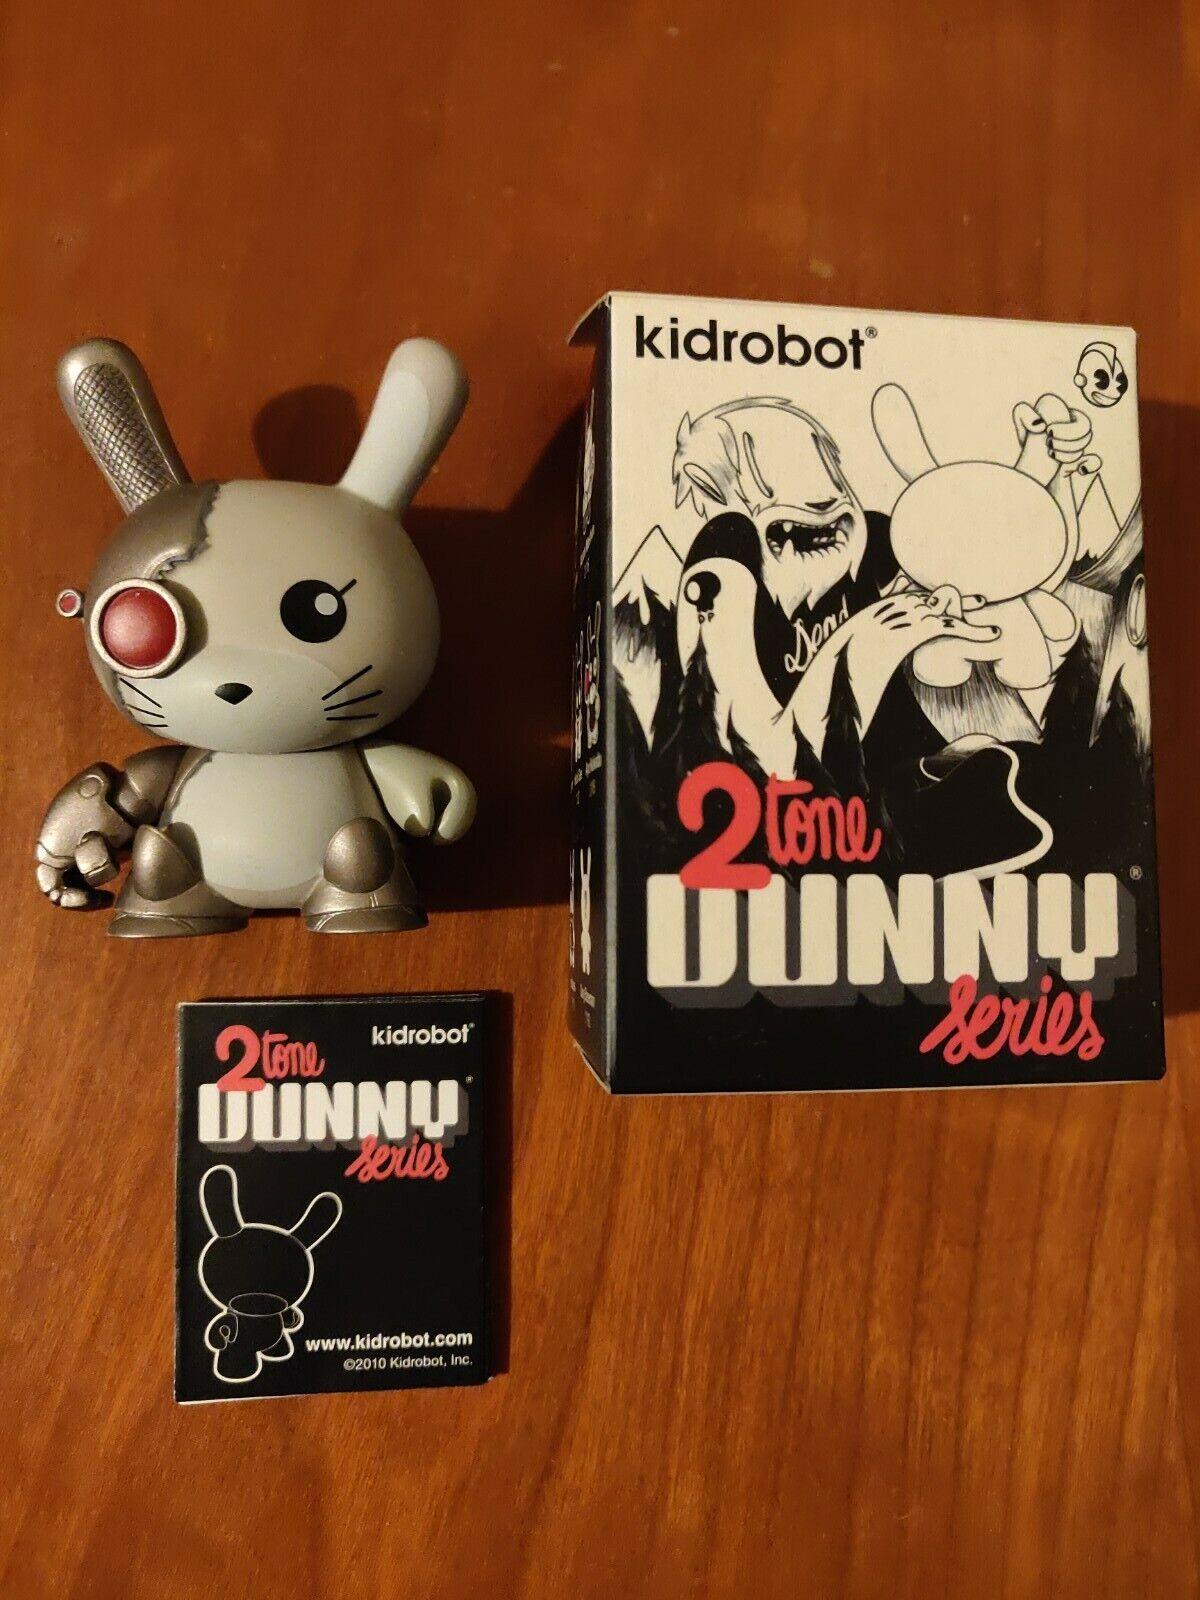 "3/"" Dunny par chuckboy 2 Tone Series Cyborg Terminator Kidrobot"